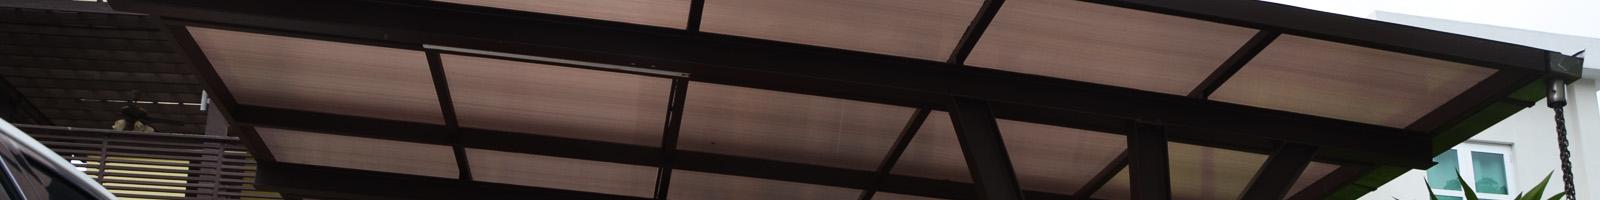 Laminated Shingles Roof Cambridge Shingles Manufacturer